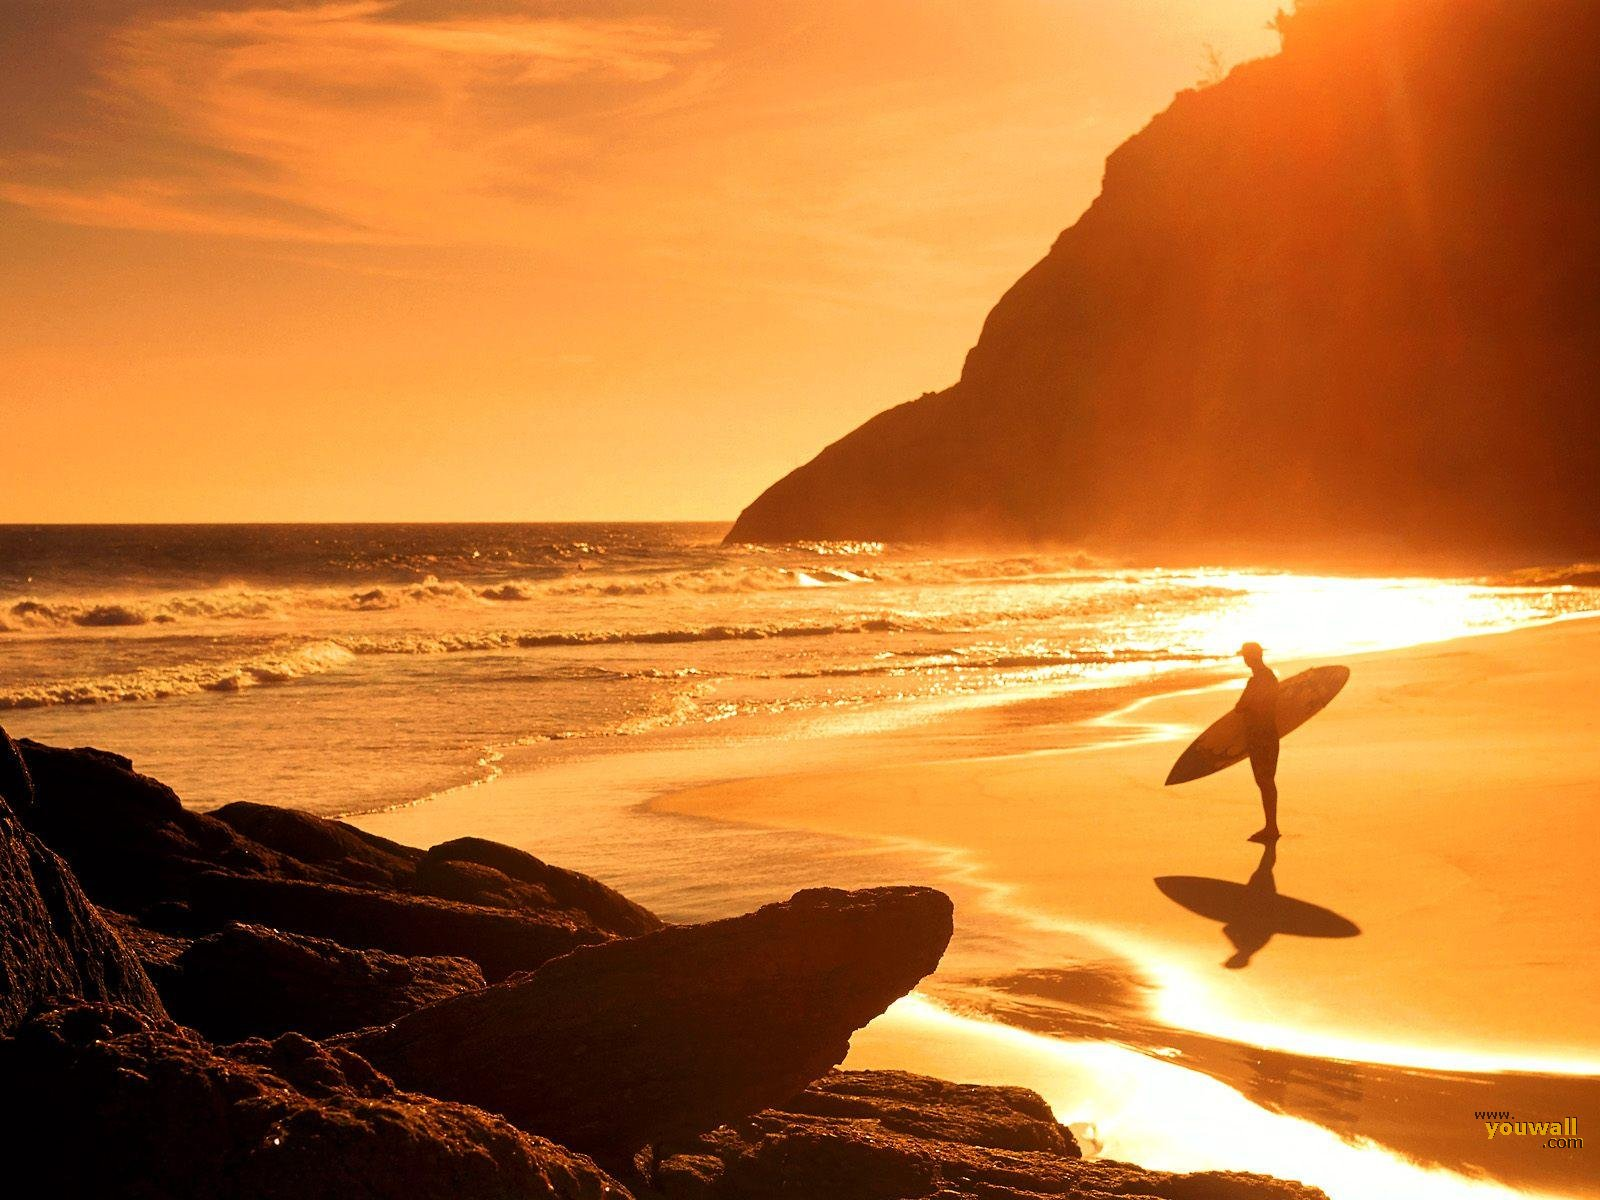 Sunset Surf backgrounds Desktop Wallpaper High Quality Wallpapers 1600x1200